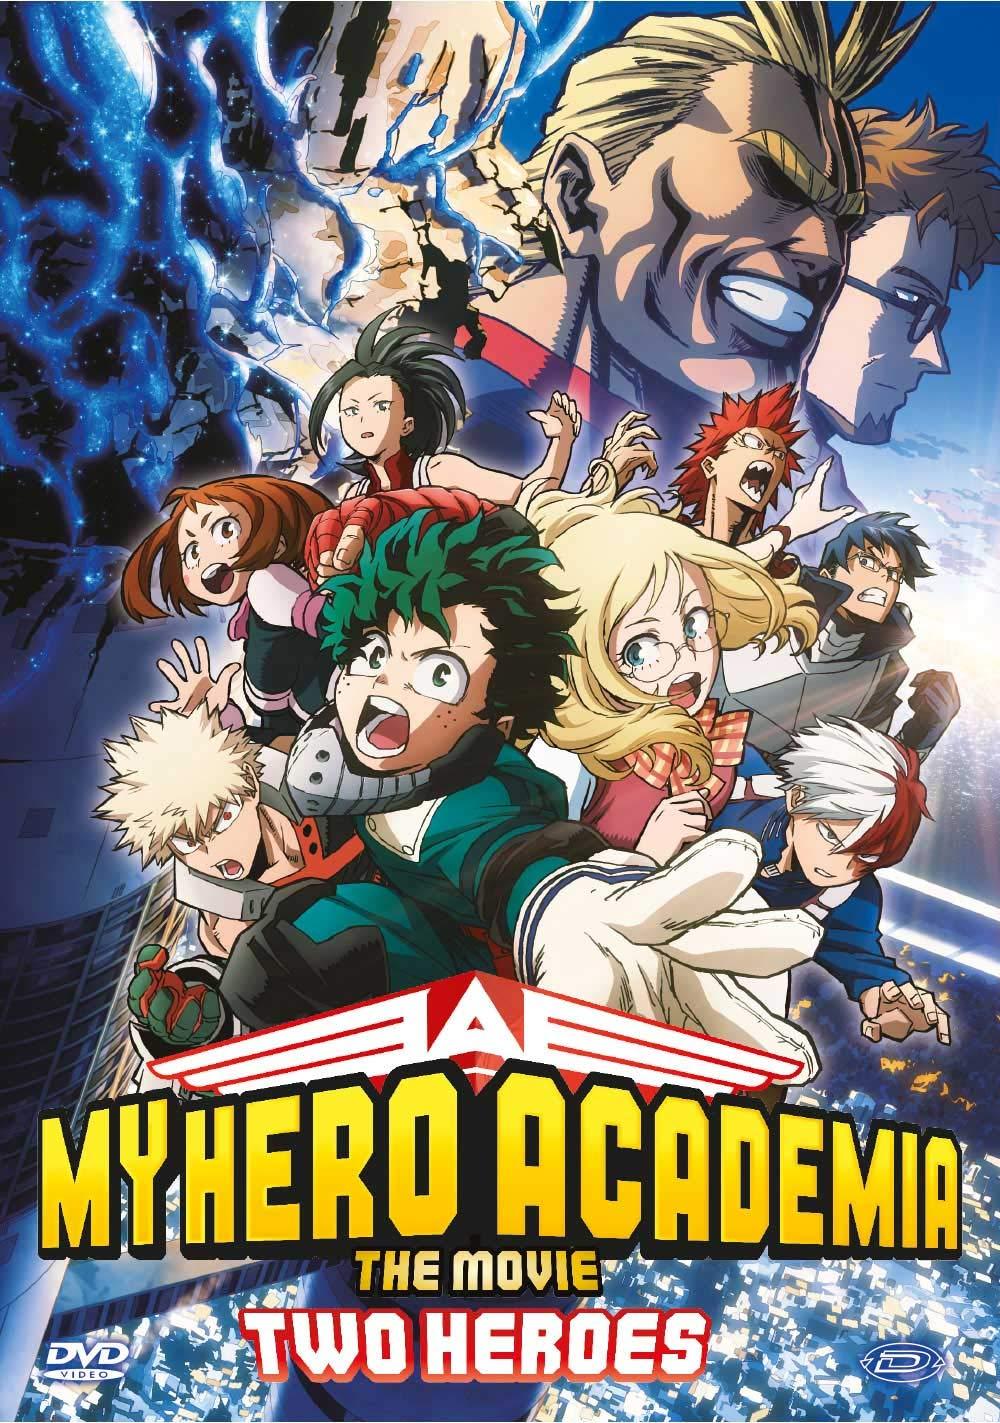 My Hero Academia - The Movie - Two Heroes Italia DVD: Amazon.es: Kenji Nagasaki: Cine y Series TV